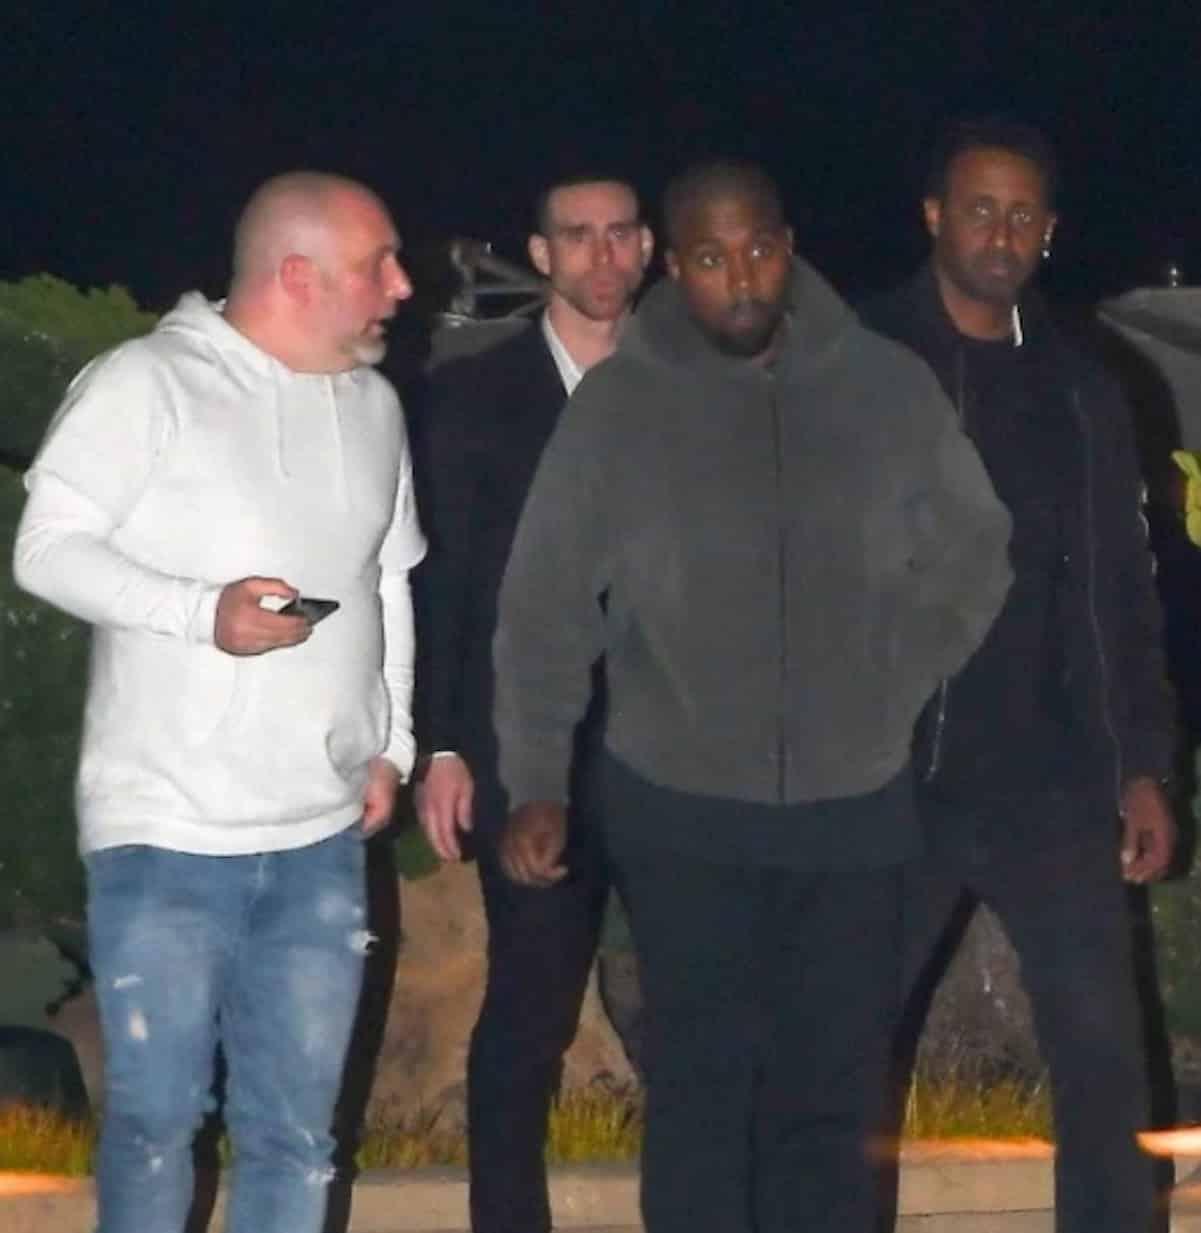 kanye bodyguards